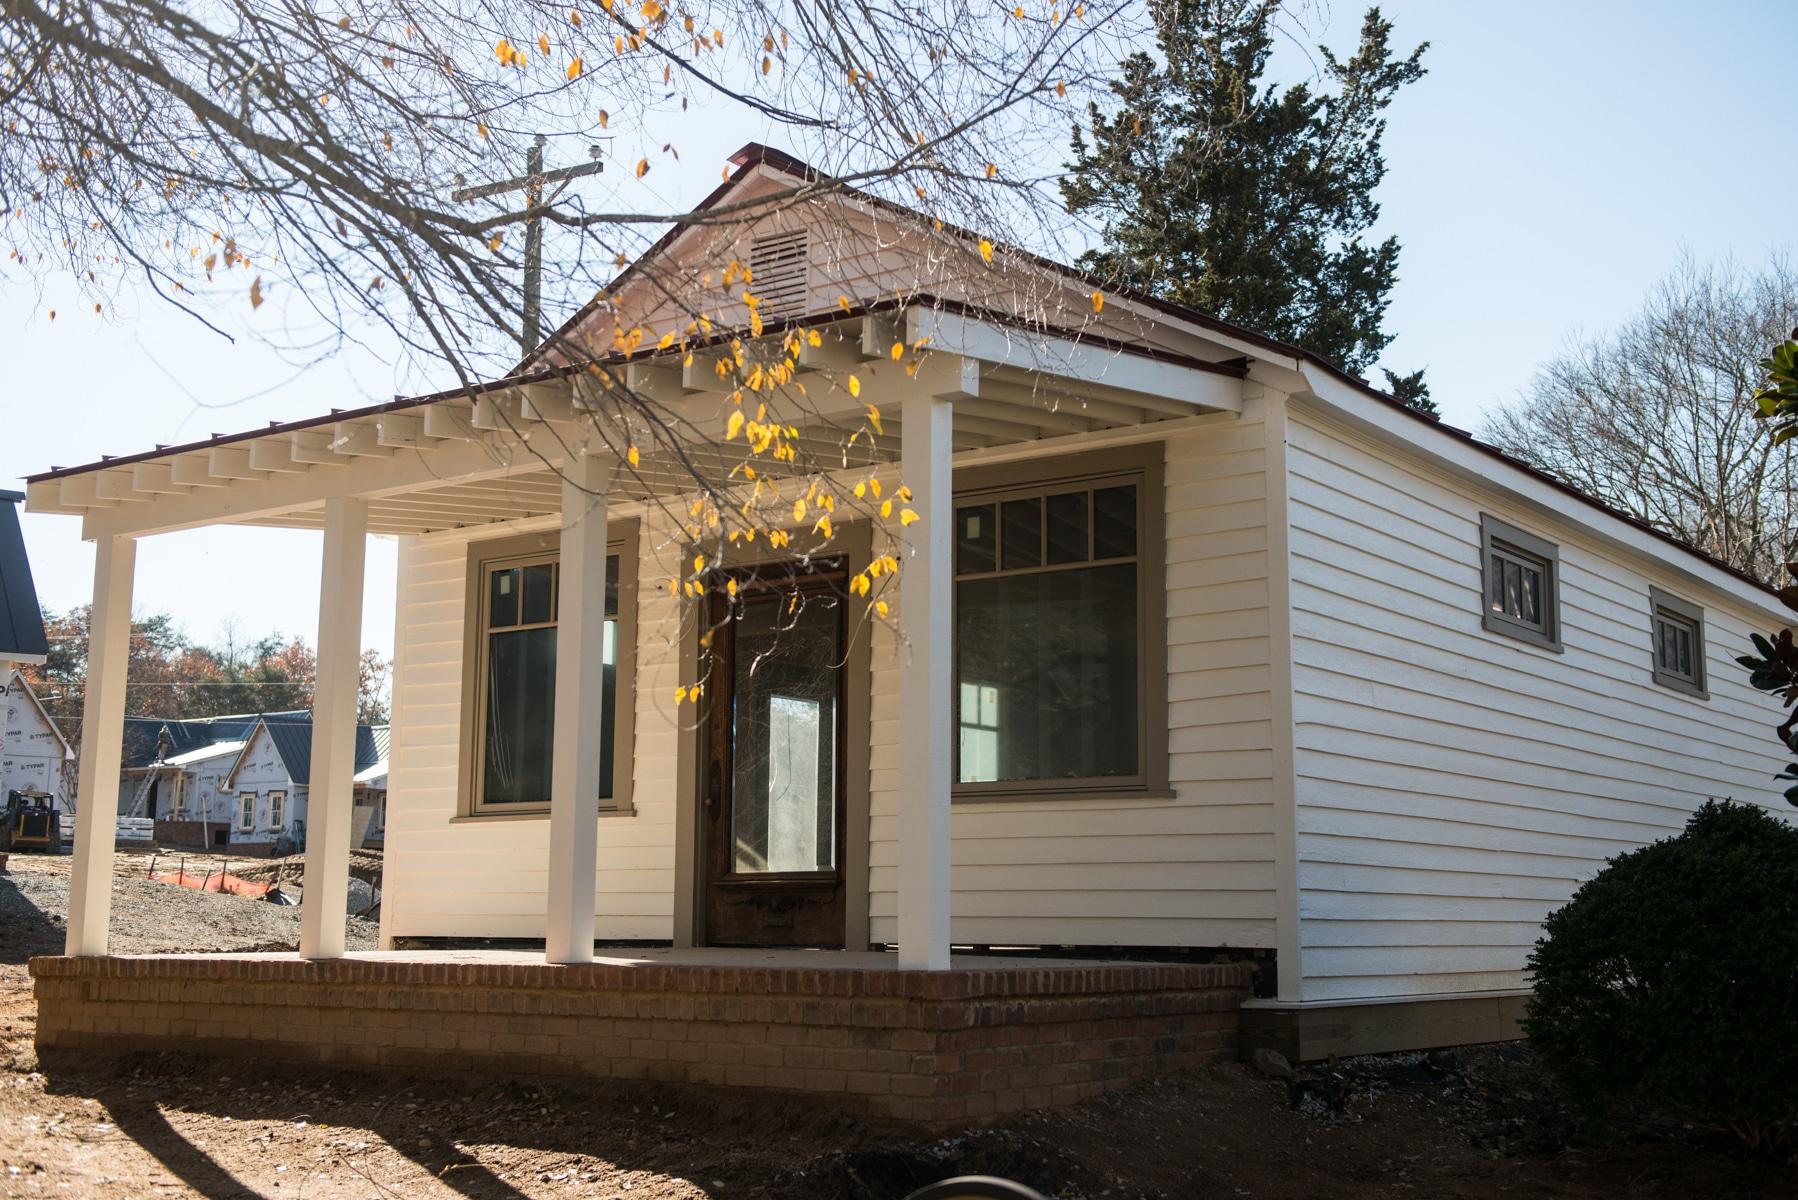 Cottage Progress Continues